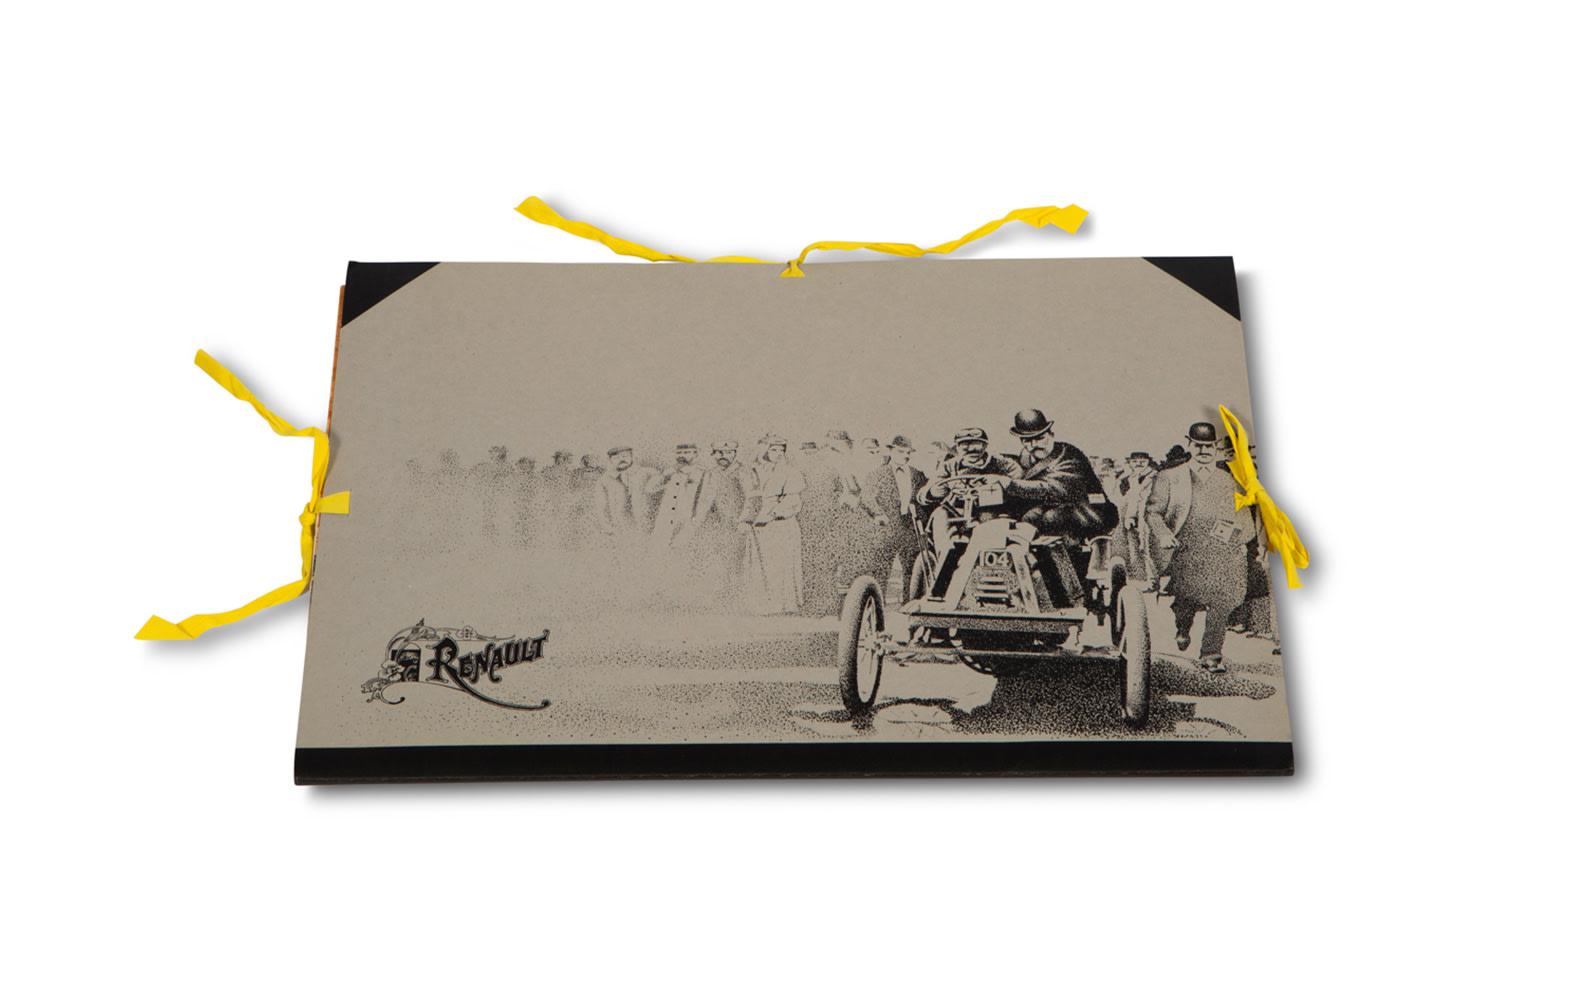 Prod/A0217_Renault_Commemorative_Racing_Prints_1_h5mqac